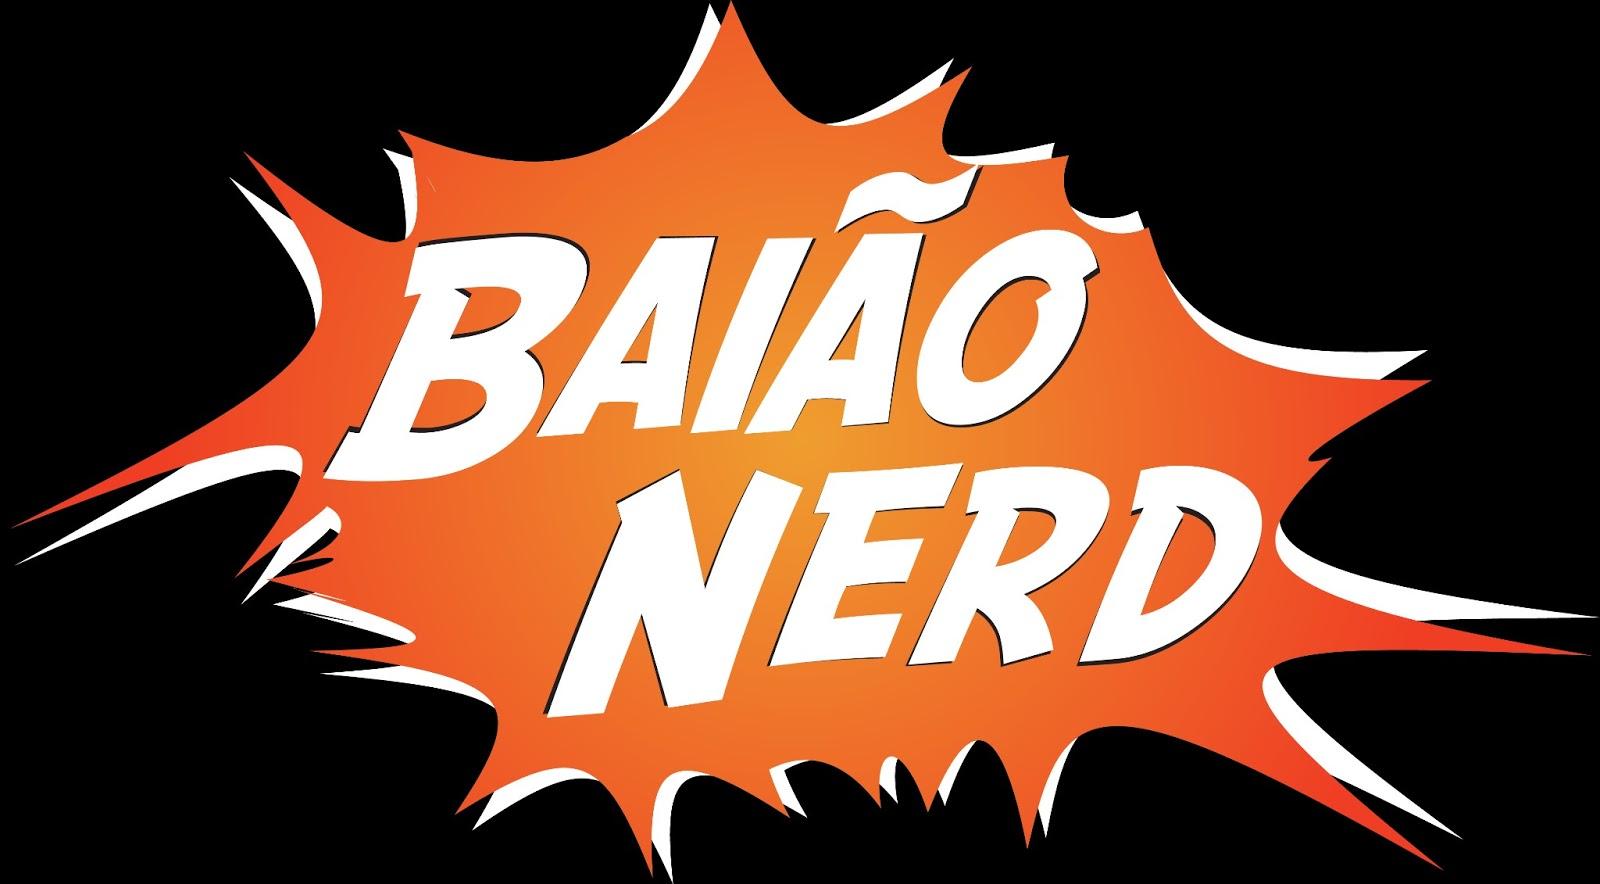 BAIÃO NERD